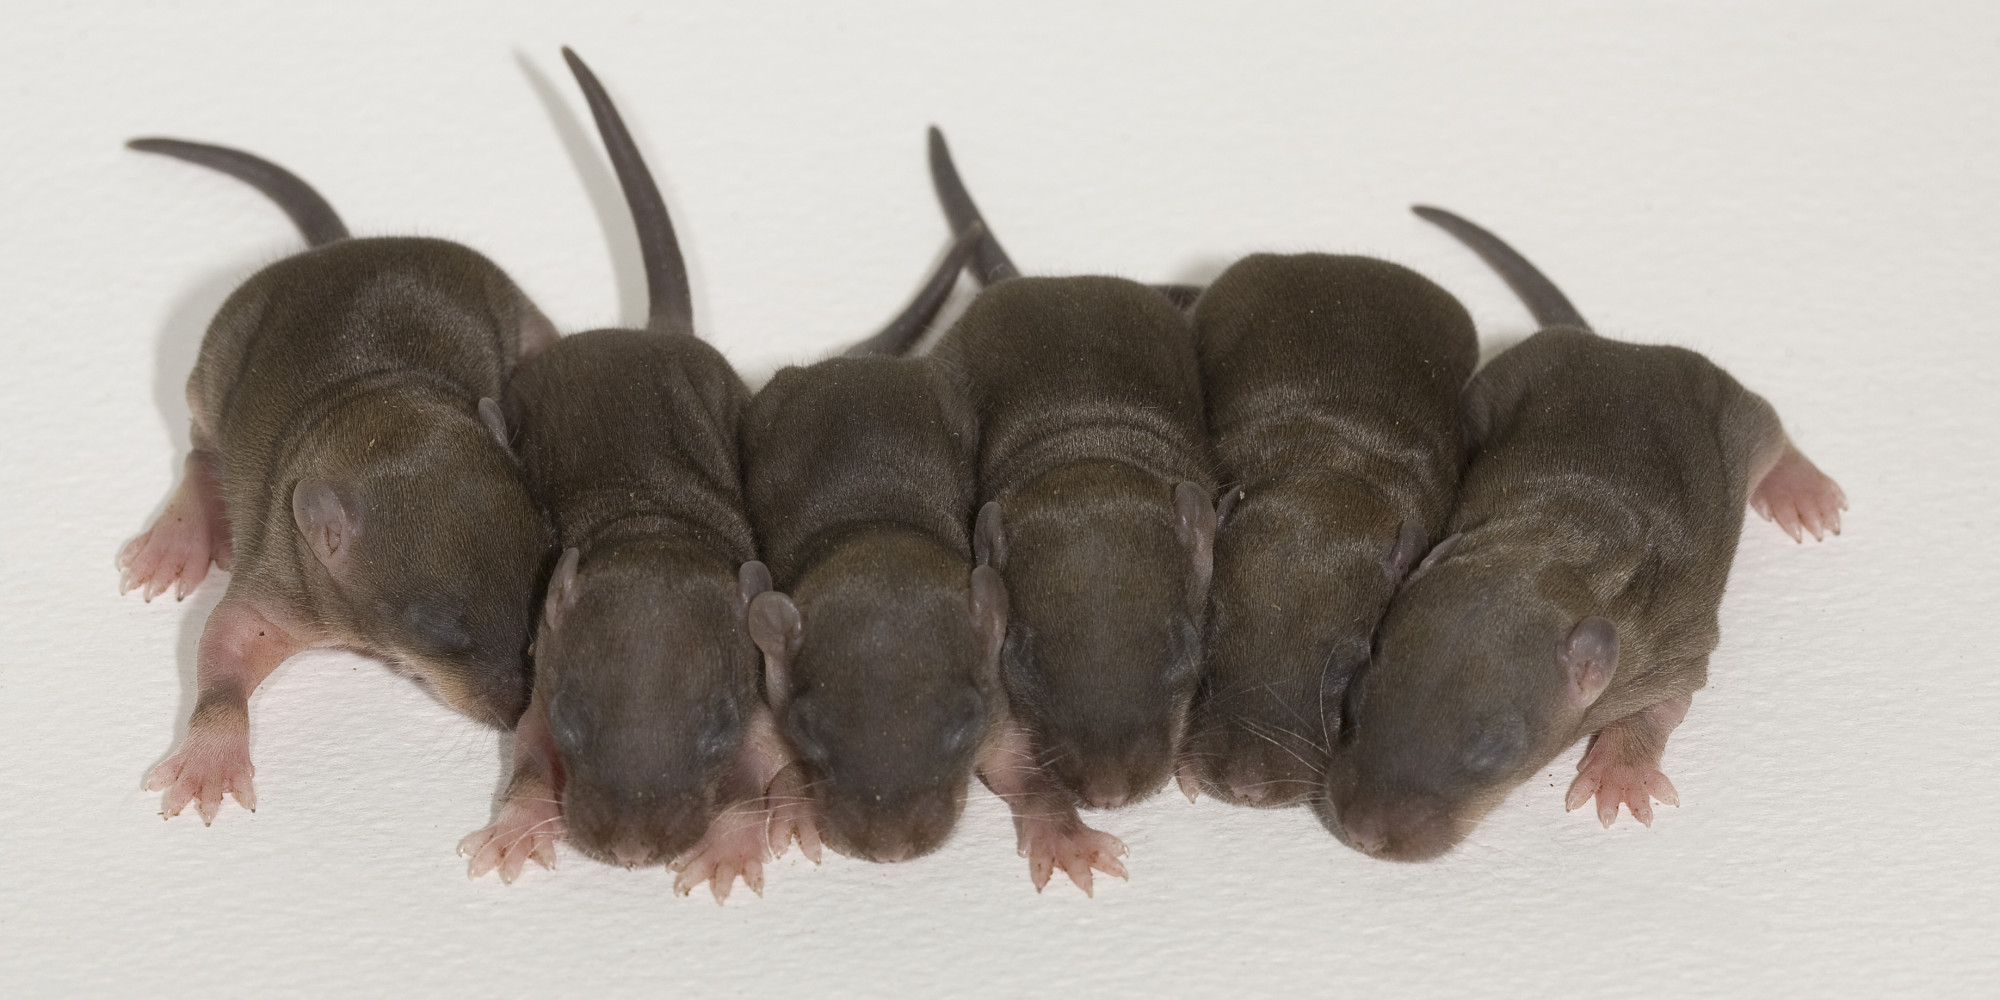 Newborn Baby Rats